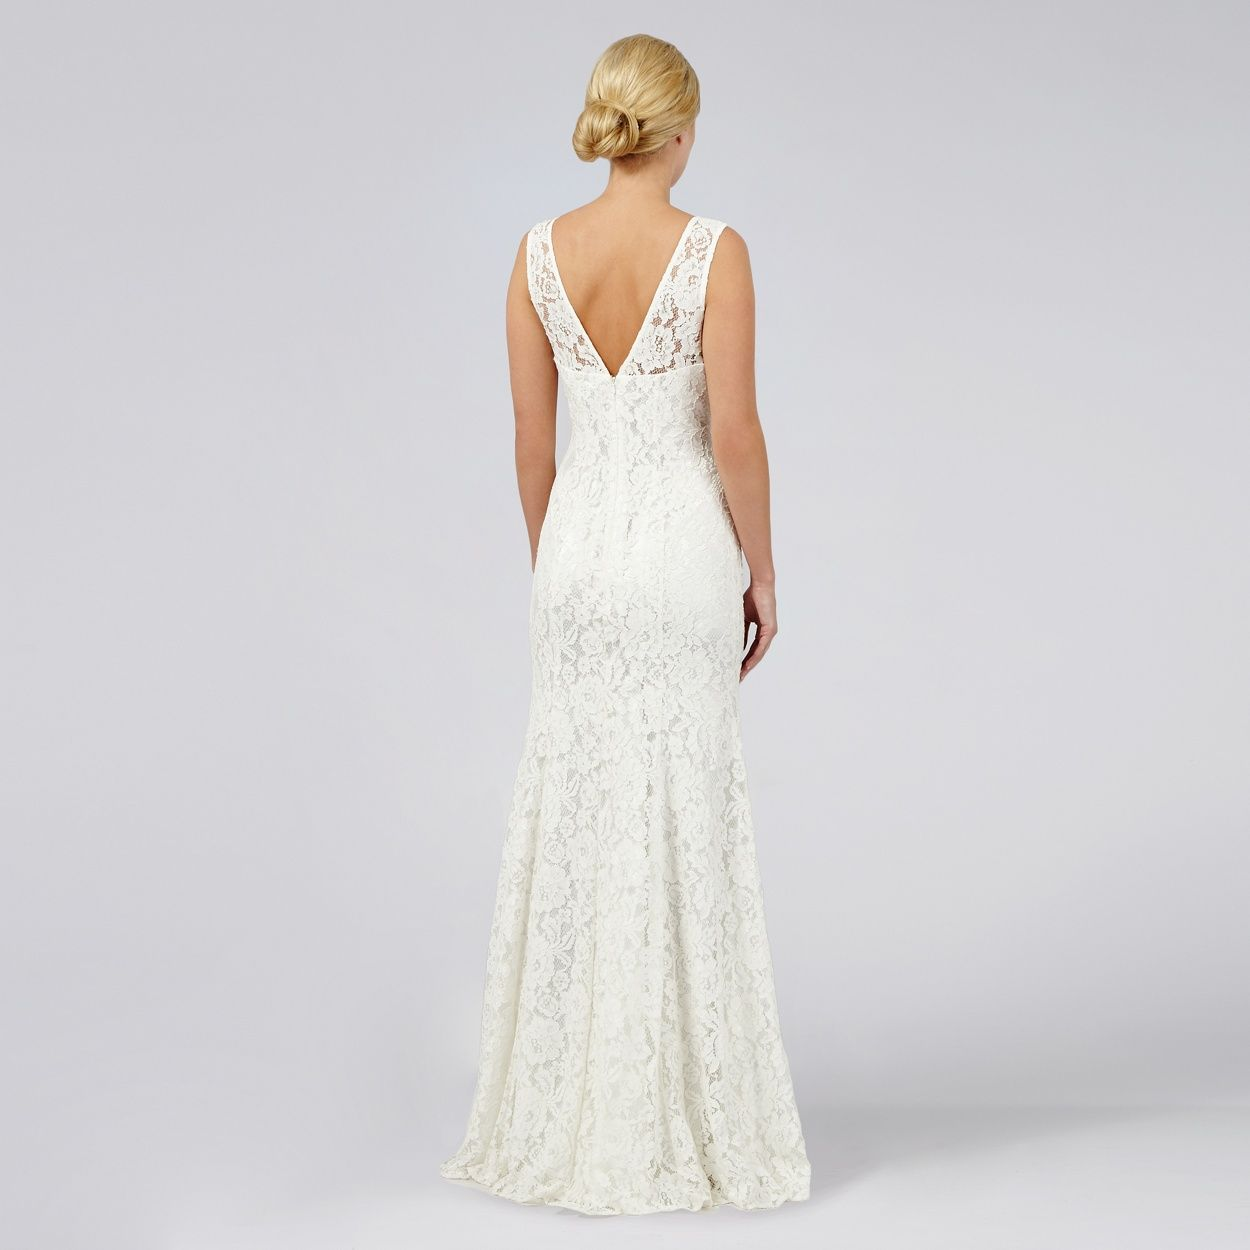 Debut elaine lace bridal dress back debenhams wedding dress debut elaine lace bridal dress back debenhams ombrellifo Gallery